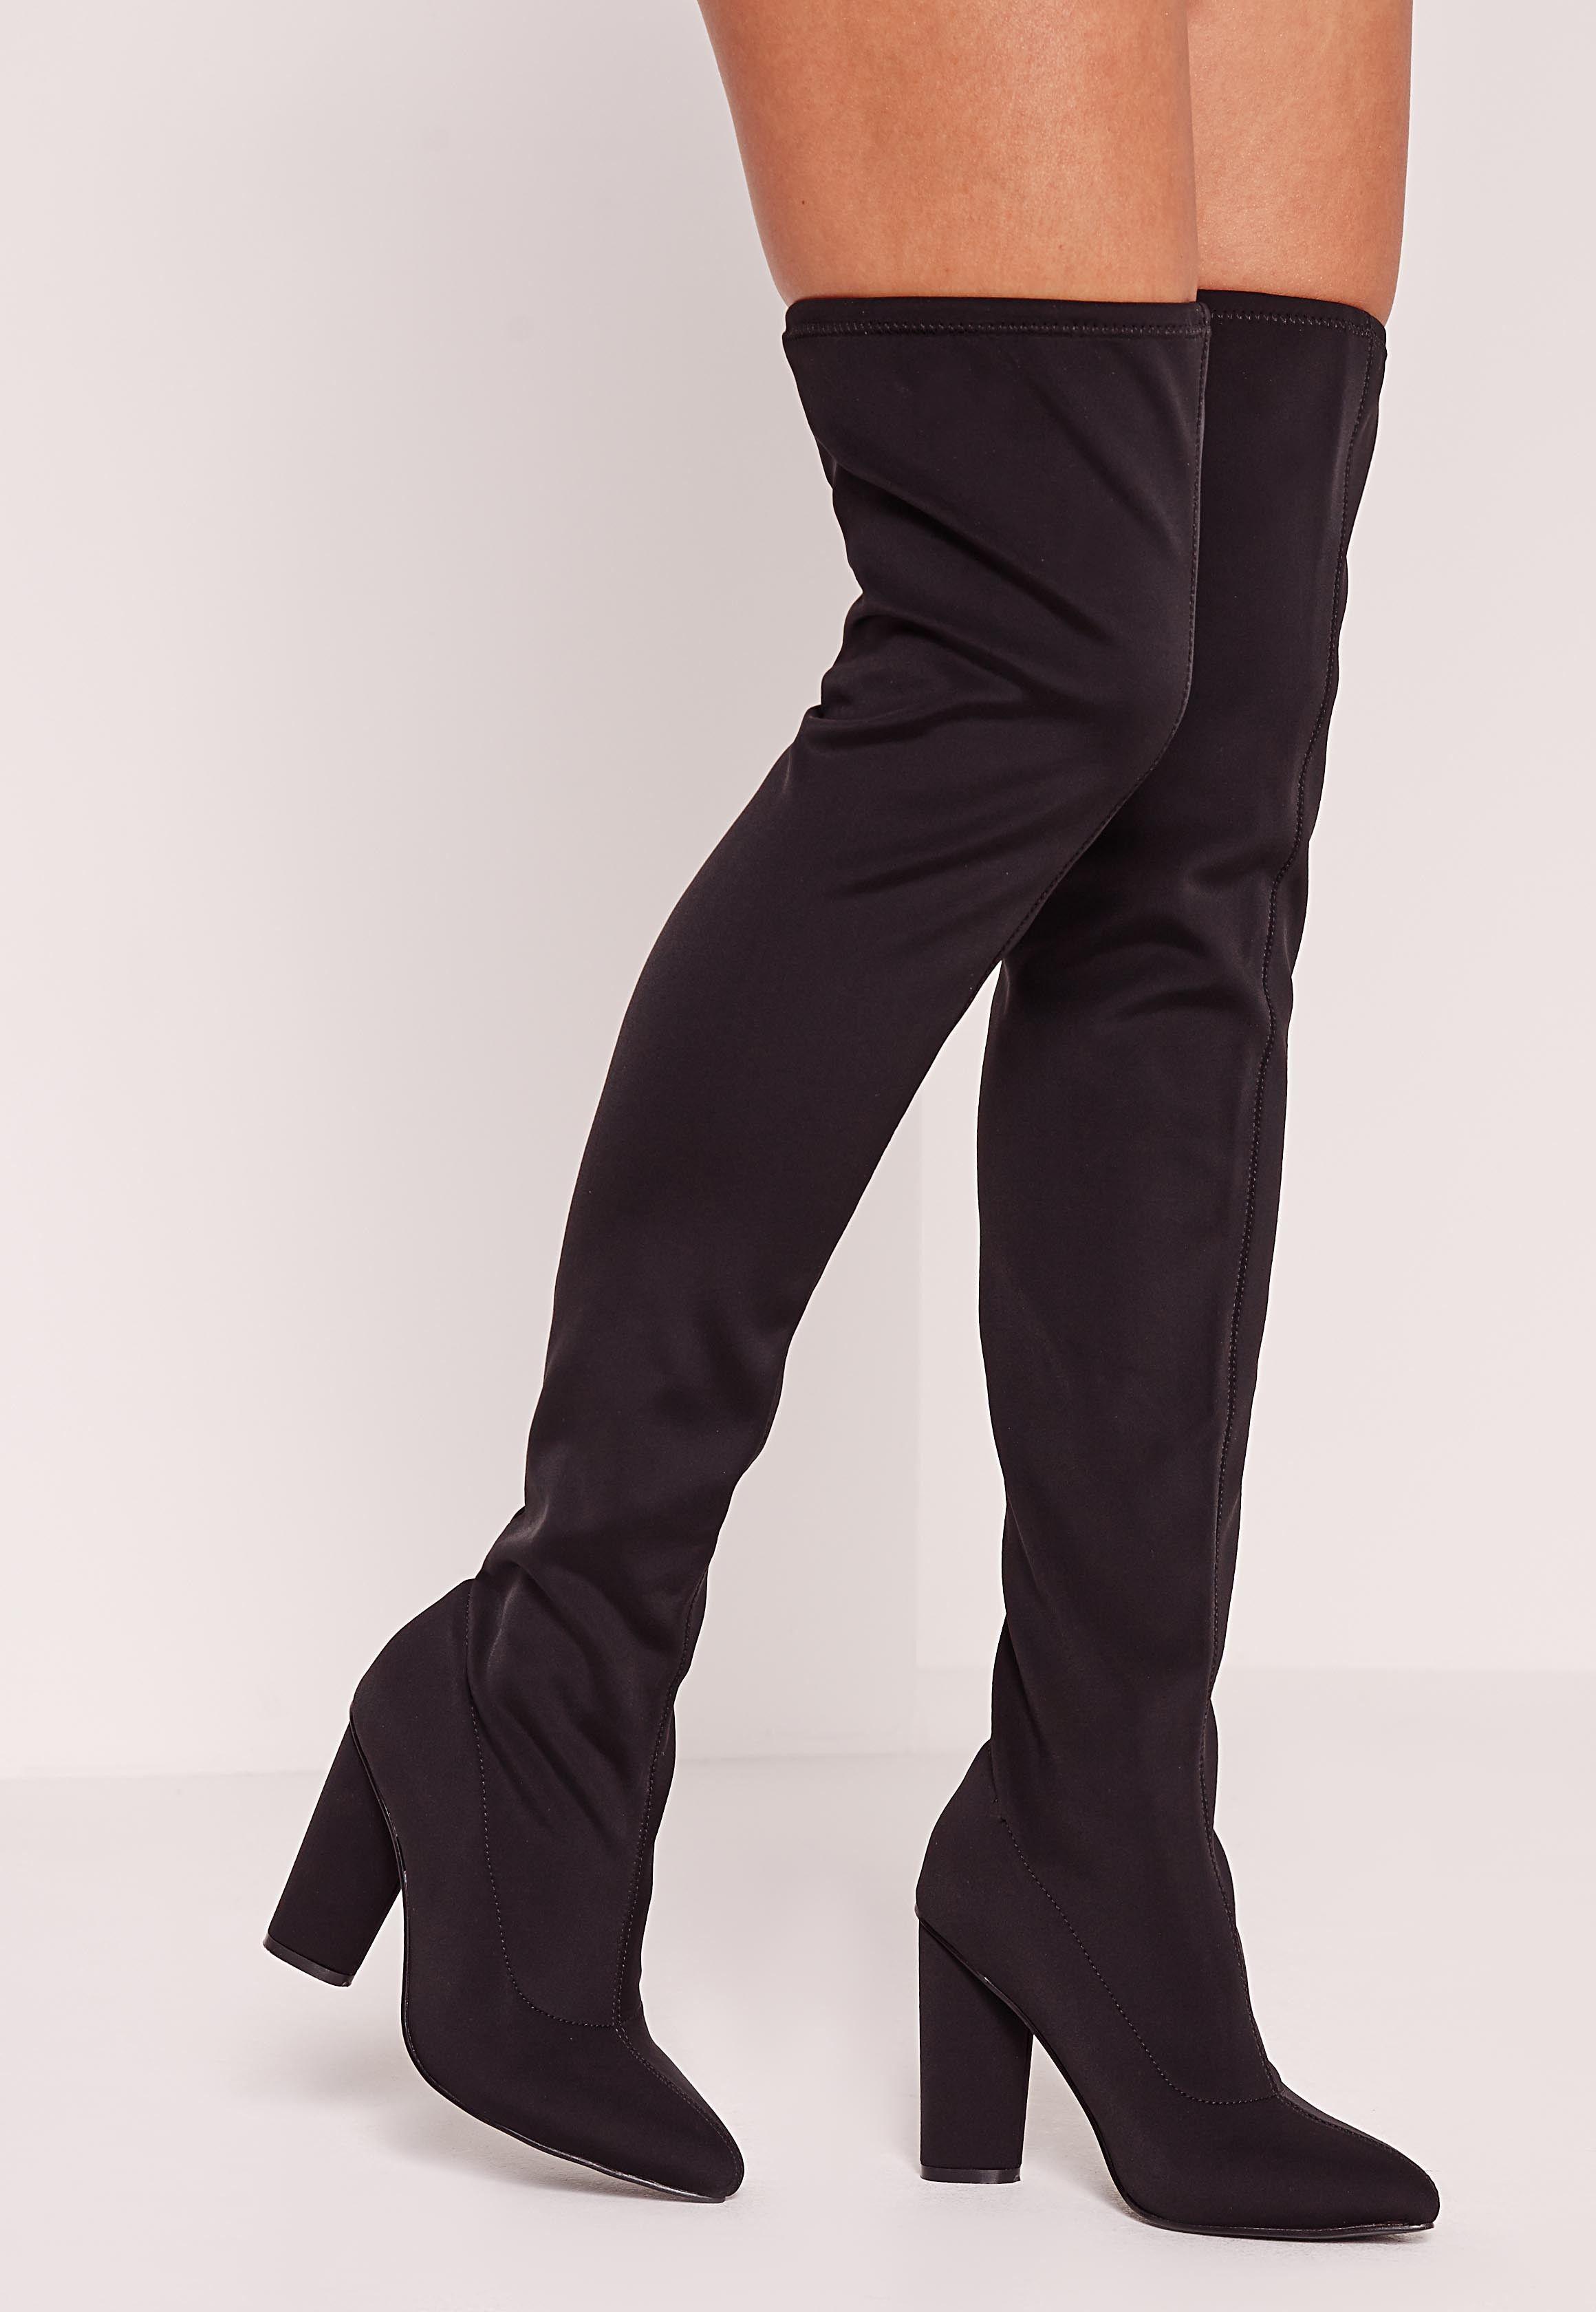 missguided - cuissardes pointues en néoprène noir | wishlist